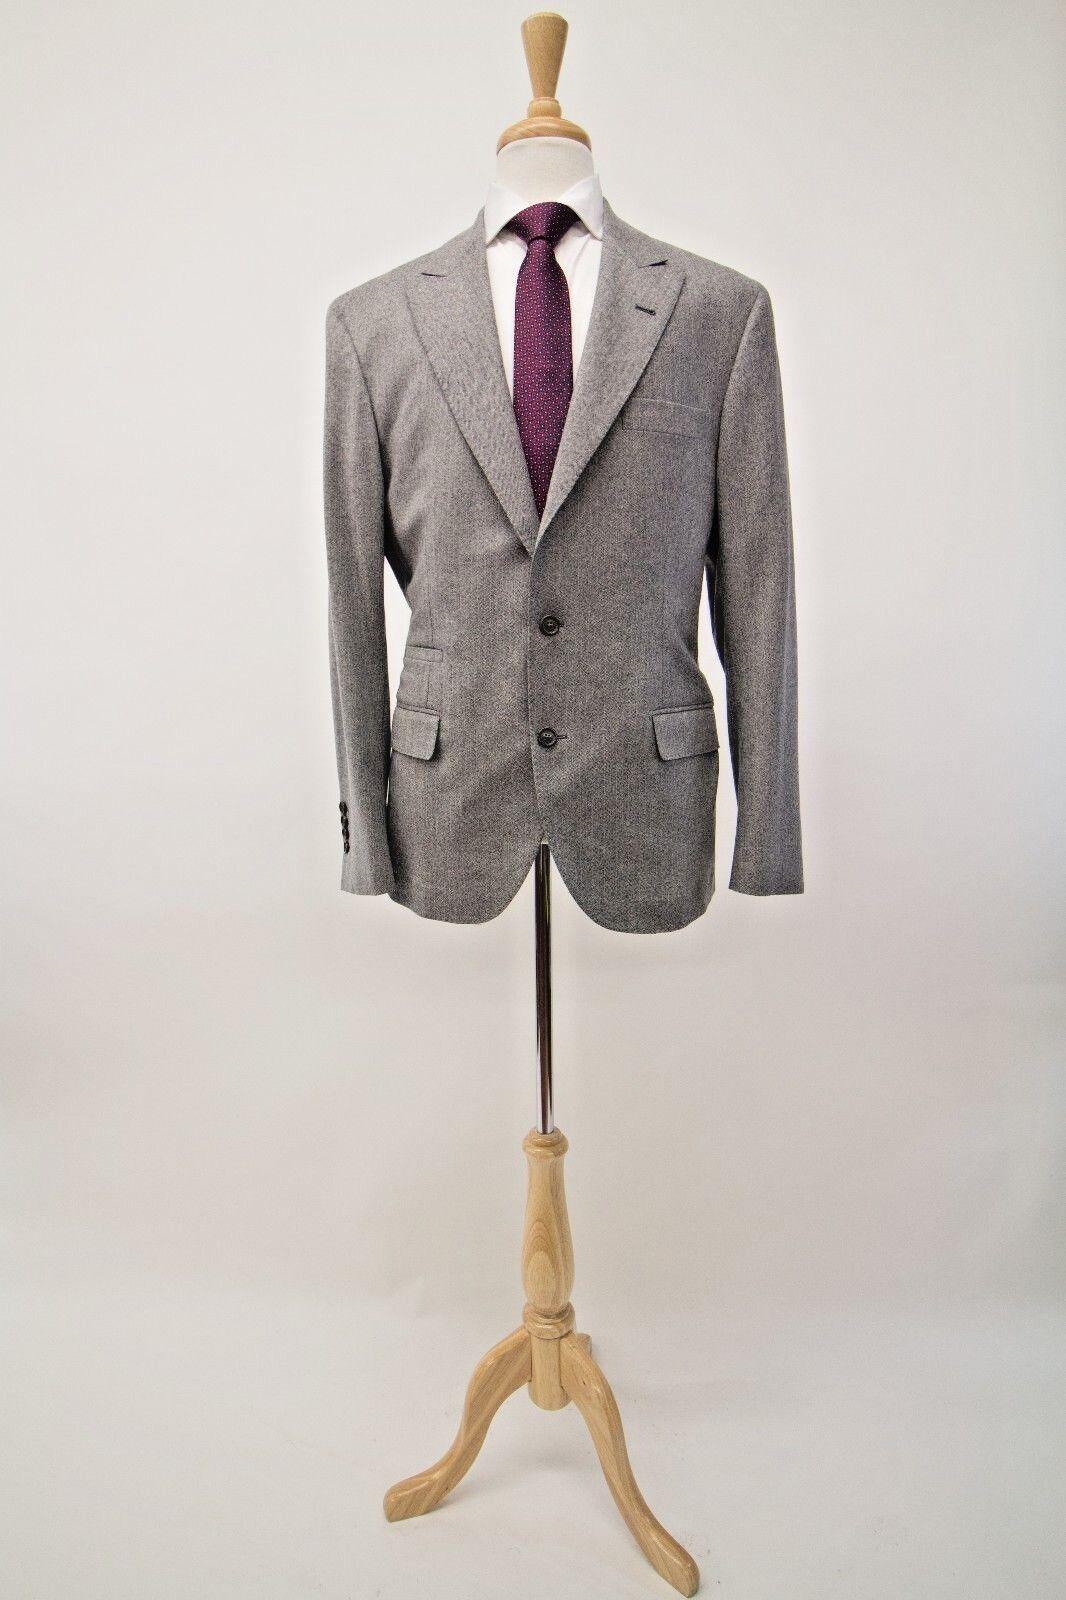 NWT4045 Brunello Cucinelli Men 100%Wool Herringbone Print 2Pc Suit 54/44US A181